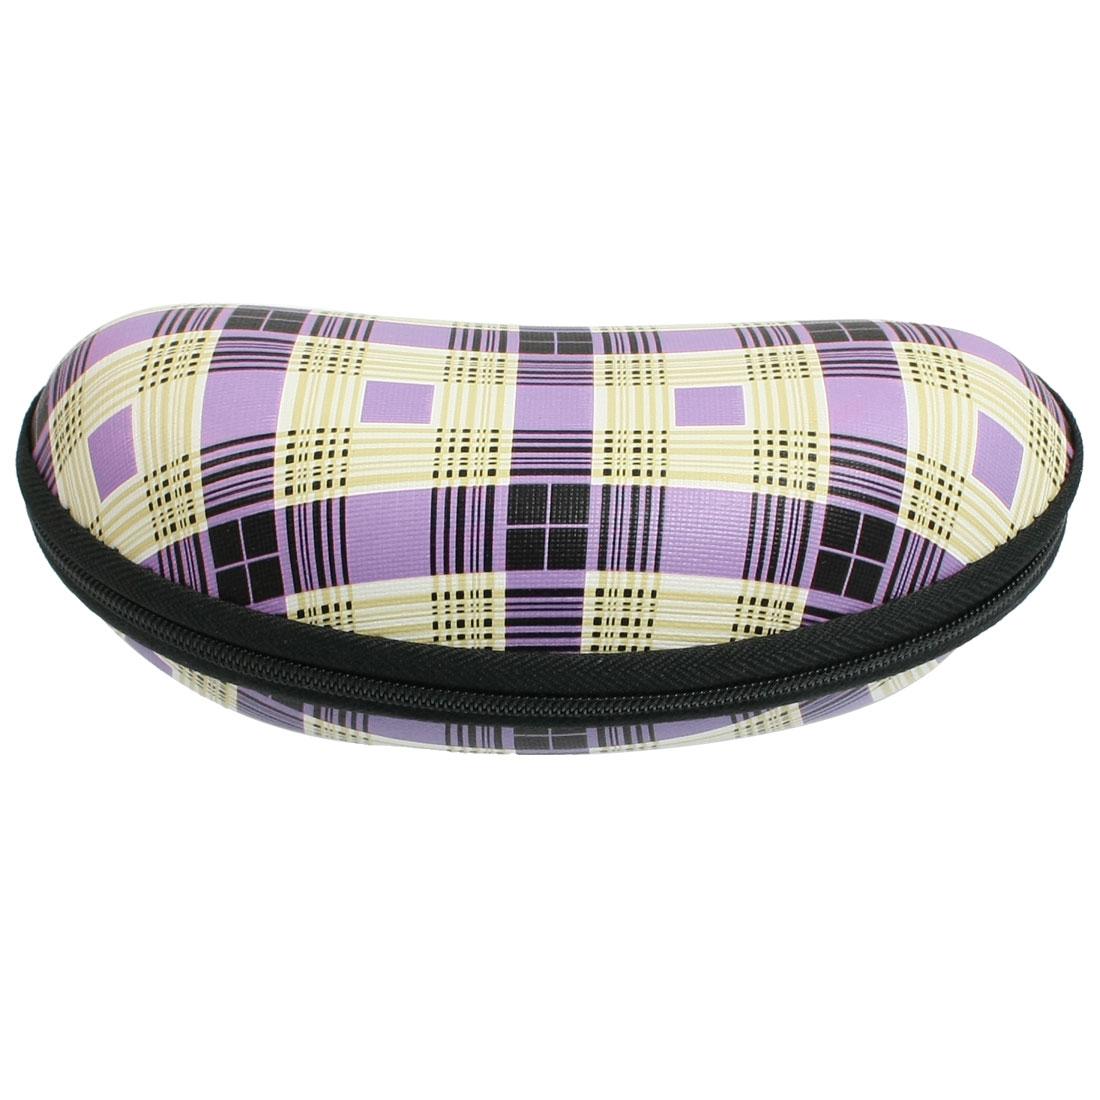 Plaid Pattern Fleece Lining Oval Shaped Zipper Closure Eyeglasses Case Purple